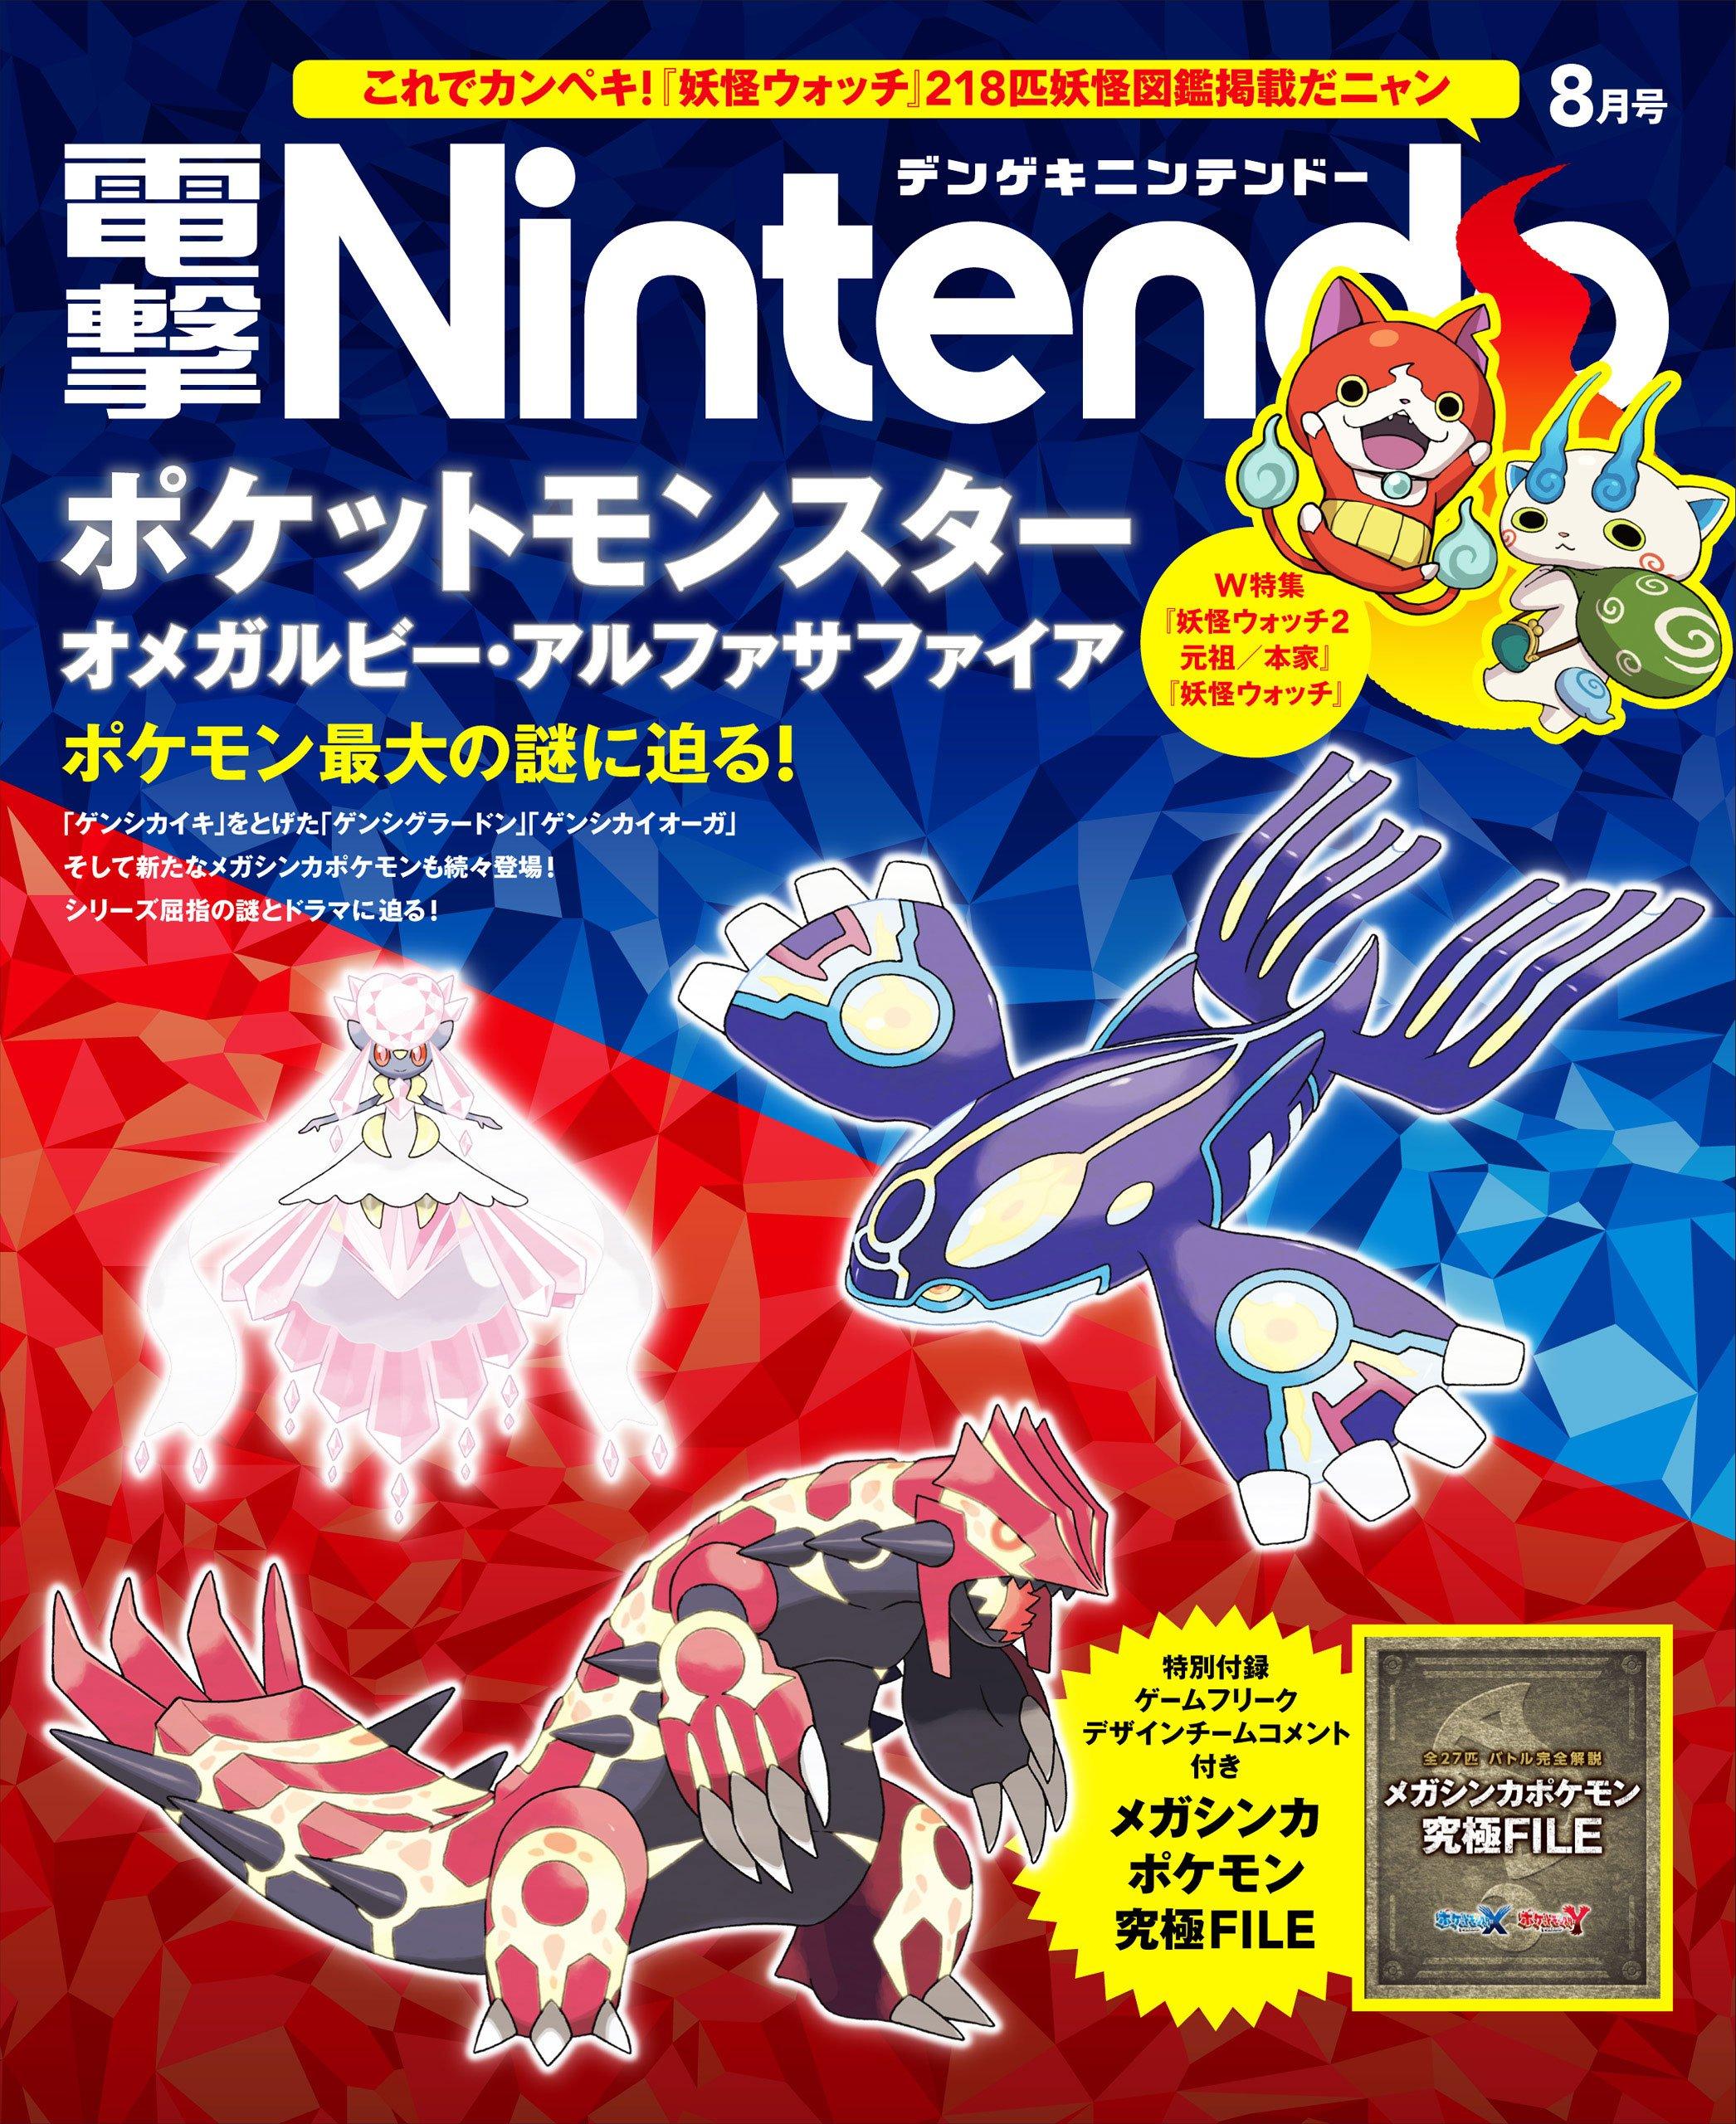 Dengeki Nintendo Issue 015 (August 2014)